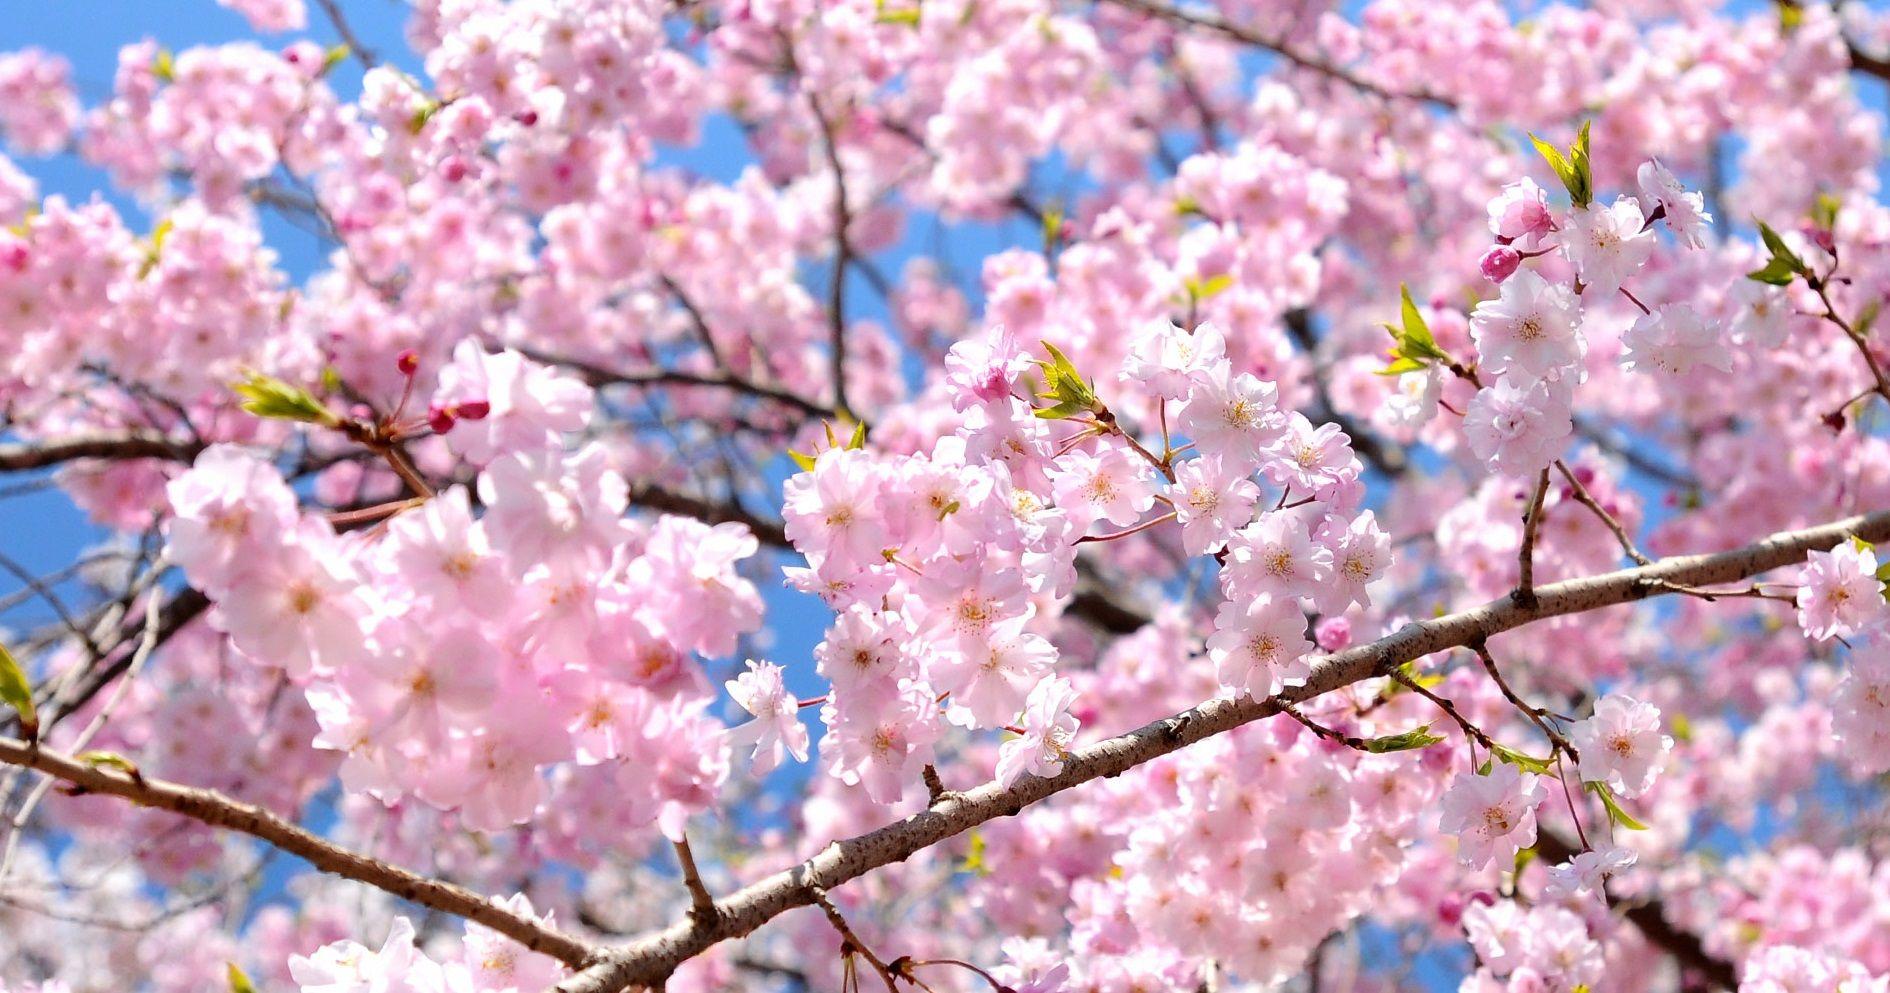 Anime Sakura Cherry Blossoms Hanami Season Cherry Blossom Japan Sakura Cherry Blossom Sakura